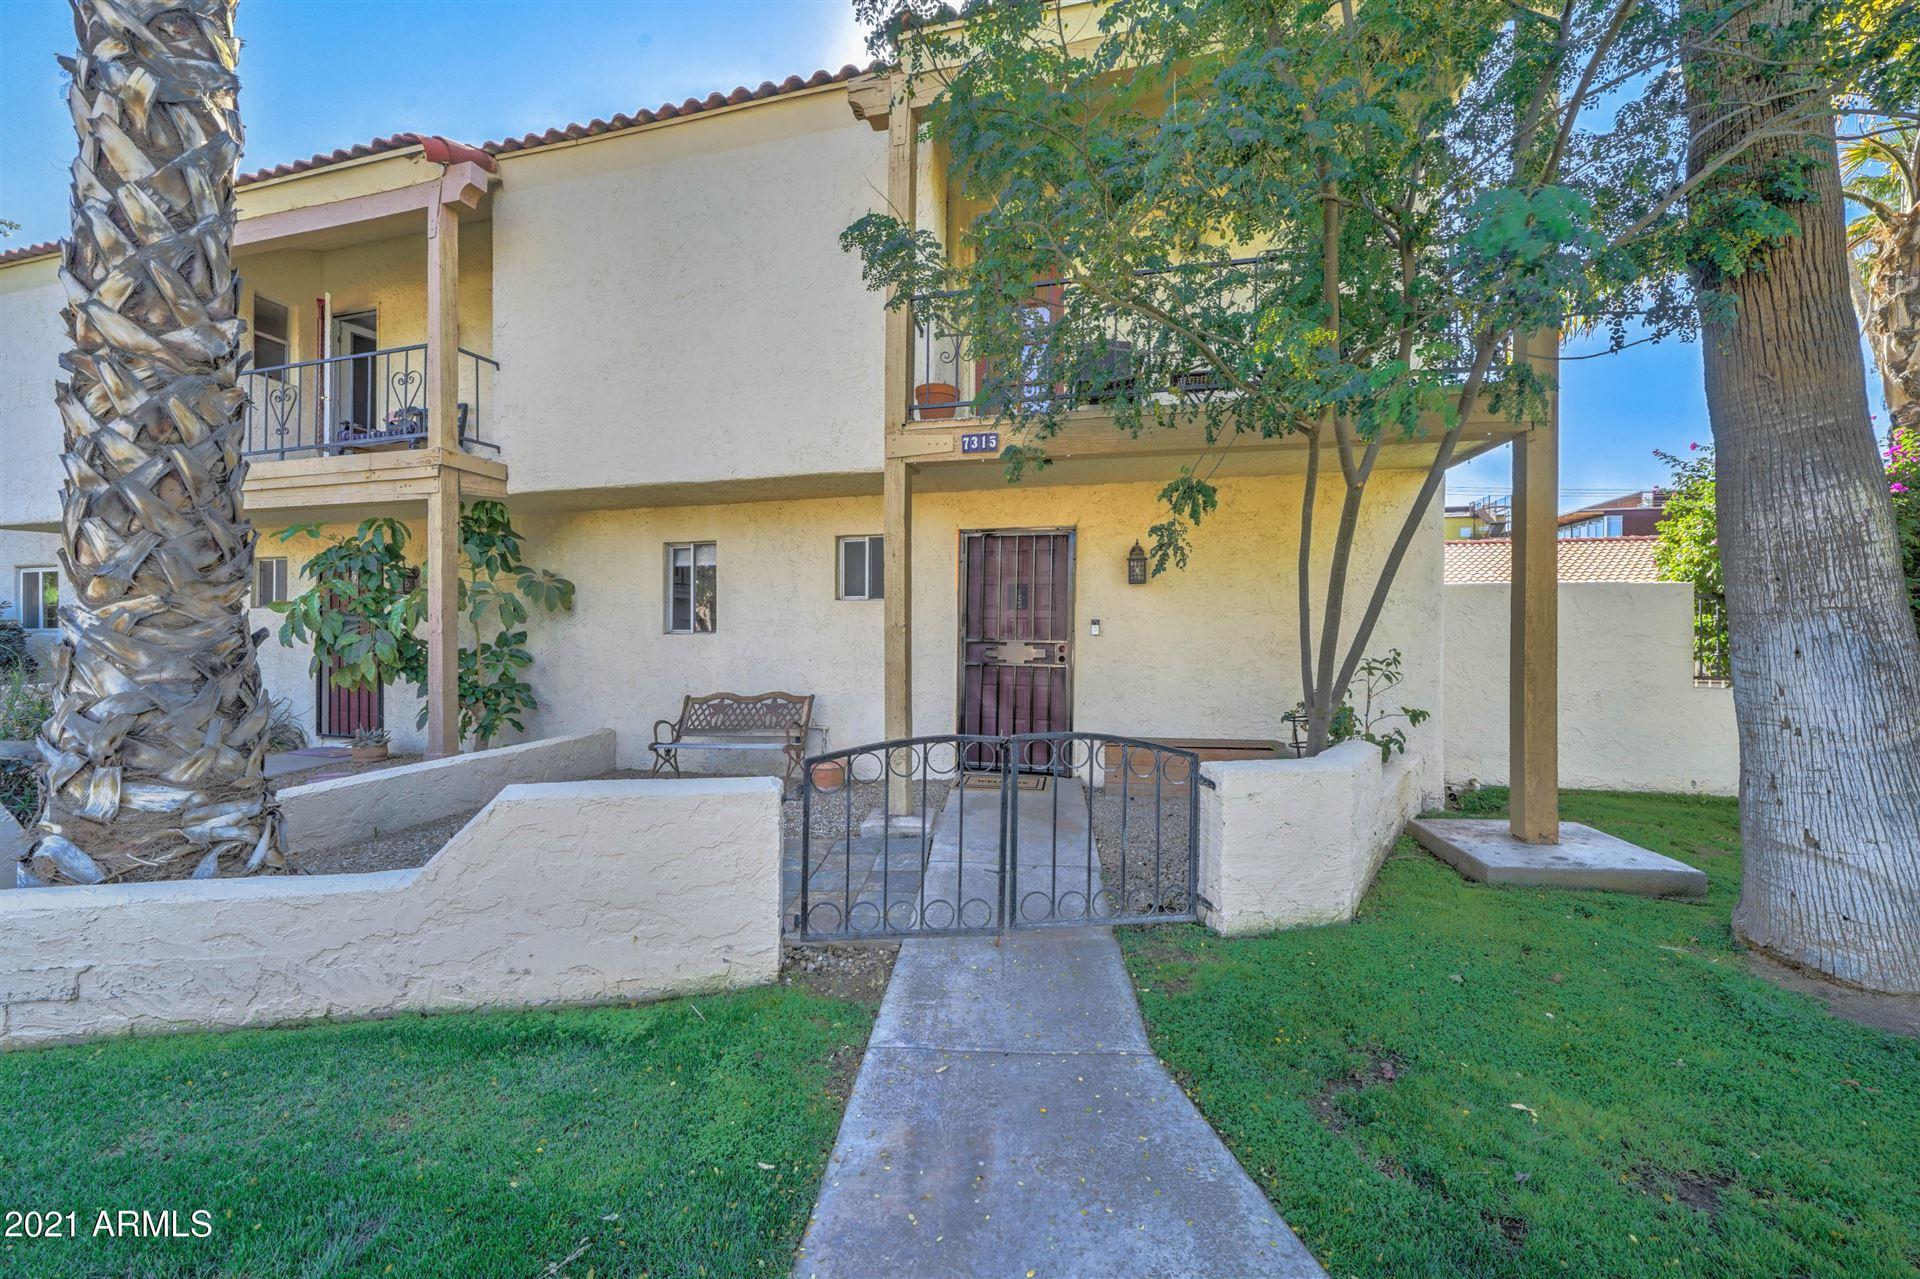 Photo of 7315 E THORNWOOD Drive, Scottsdale, AZ 85251 (MLS # 6189073)